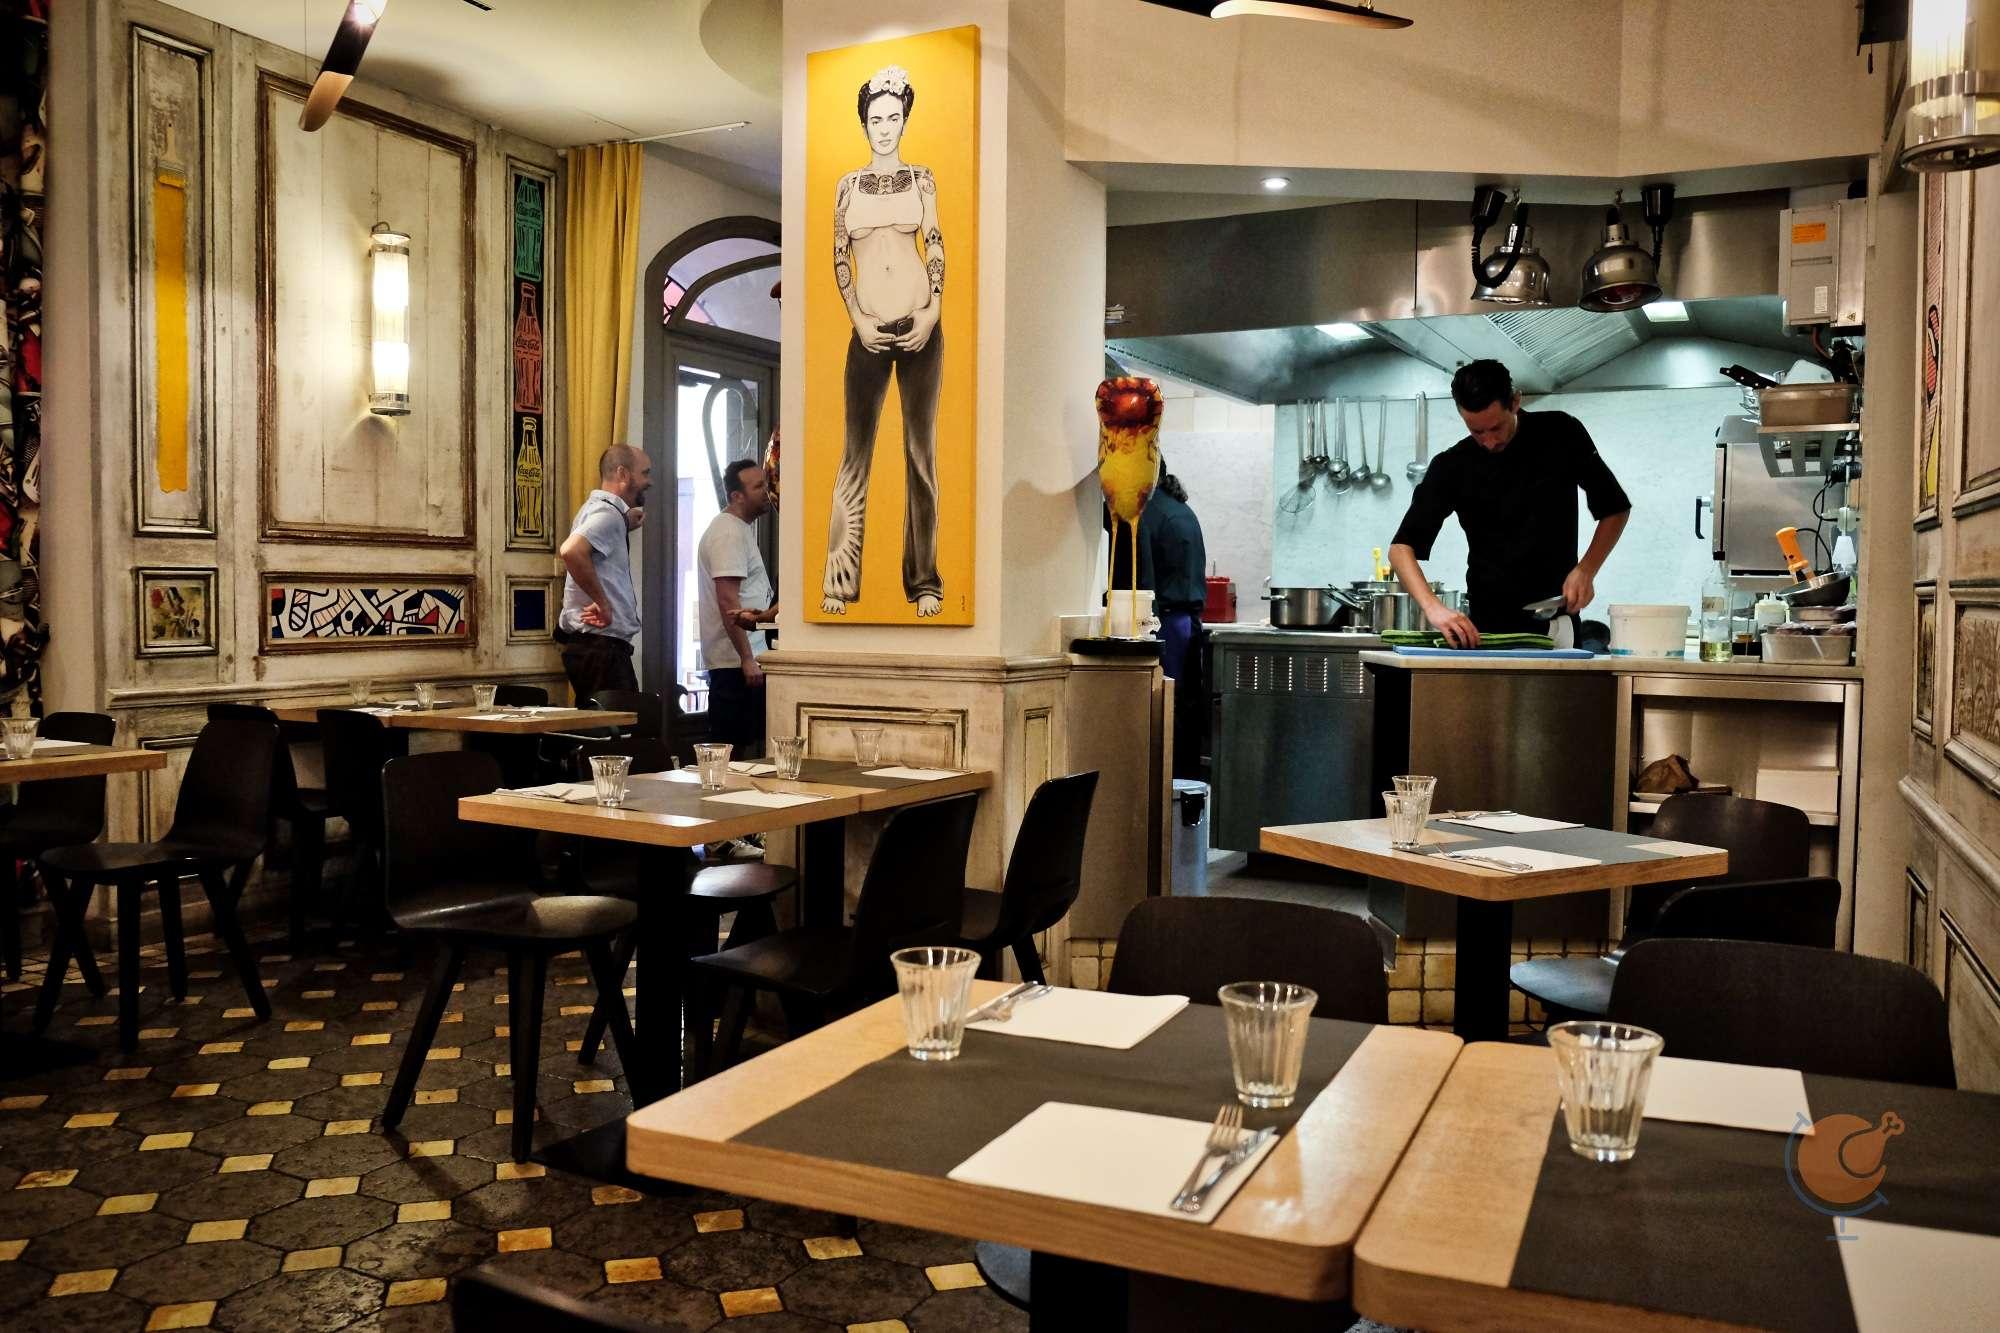 dscf1417_bar_des_oiseaux_restaurant_france_nice_nizza_vilagevo_jokuti_andras_l_w.jpg